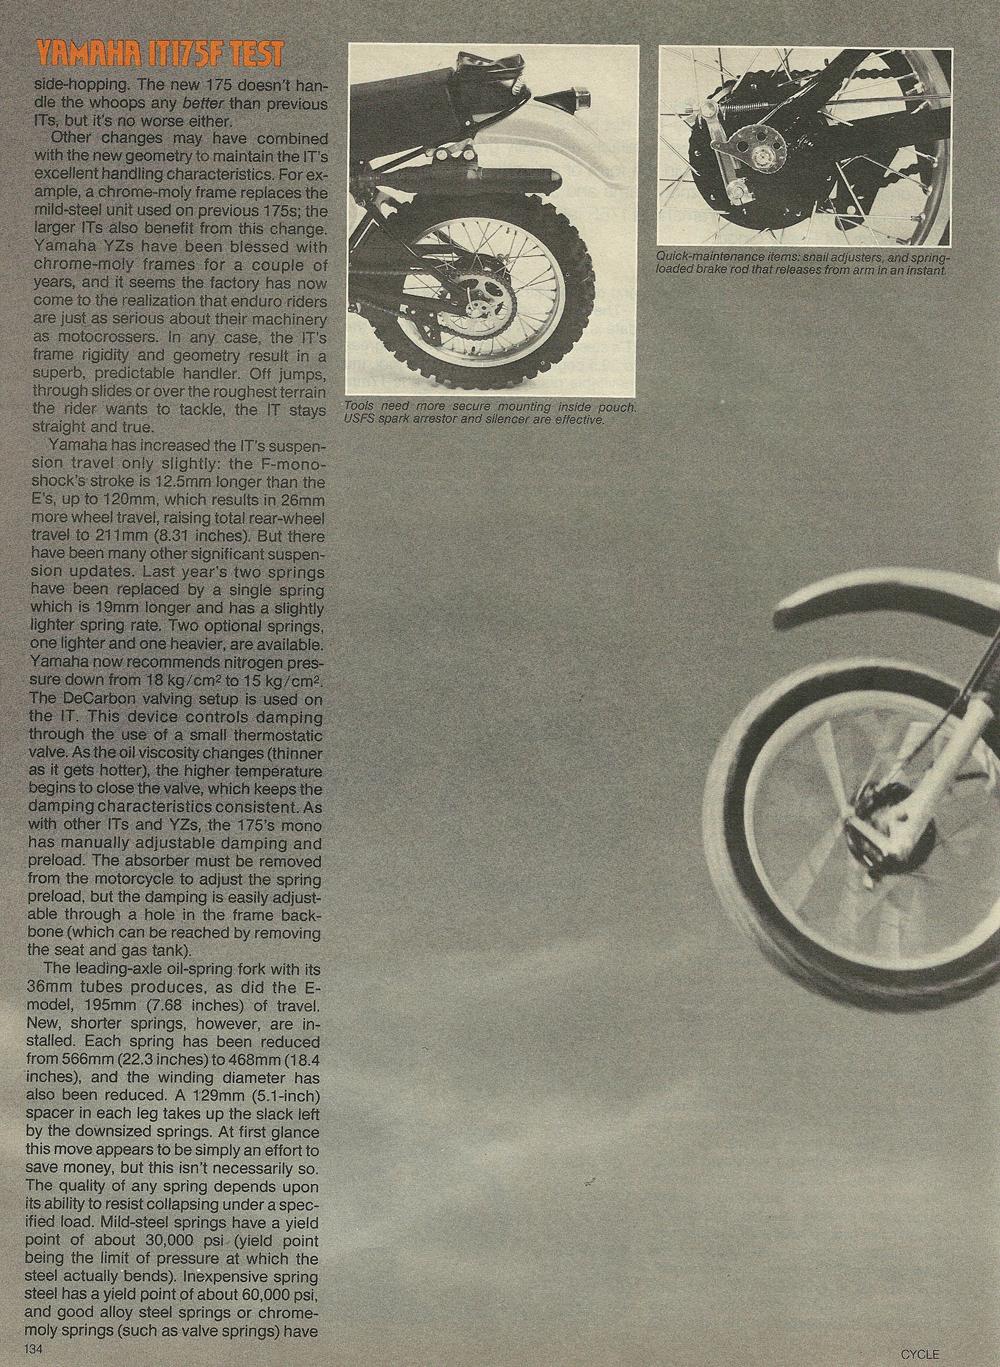 1979 Yamaha IT175F off road test 3.jpg